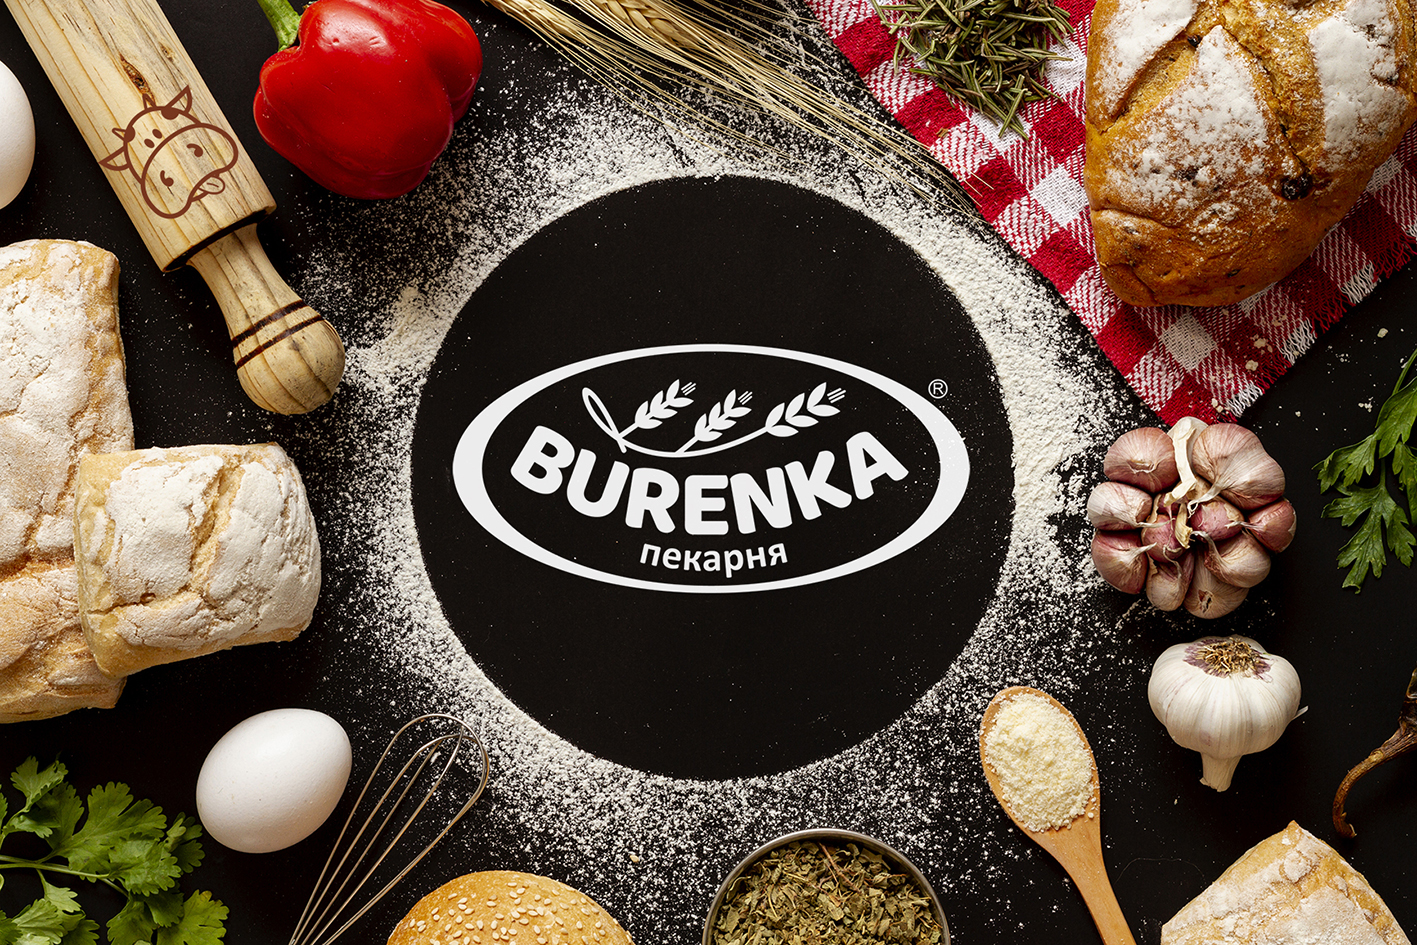 Логотип для Бургерной с Пекарней фото f_9715e18f5c707f16.jpg